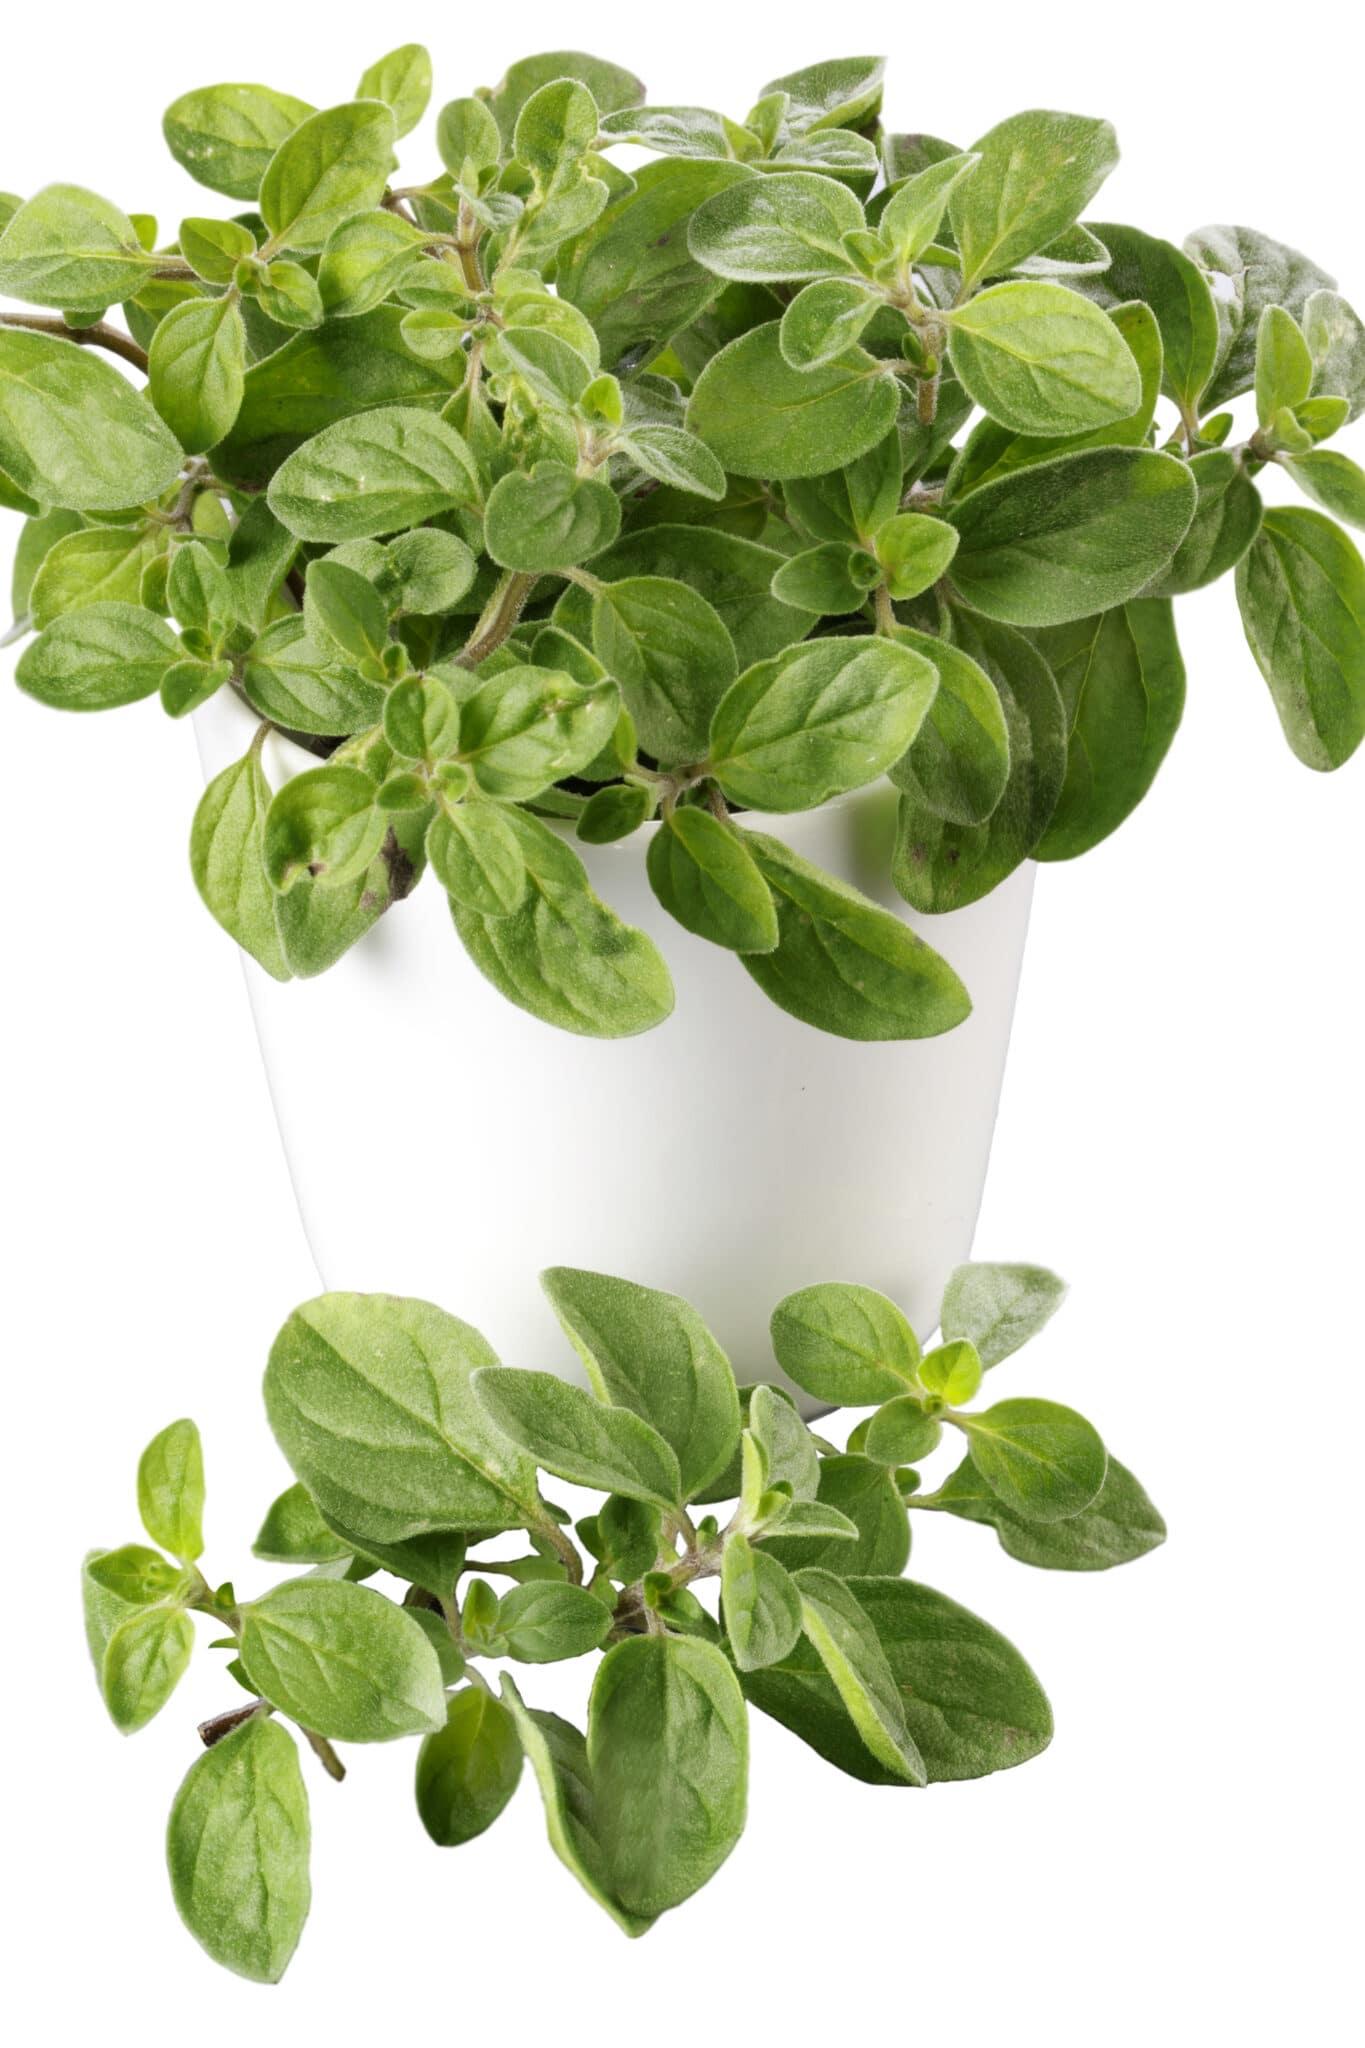 White pot filled with fresh green oregano plant.